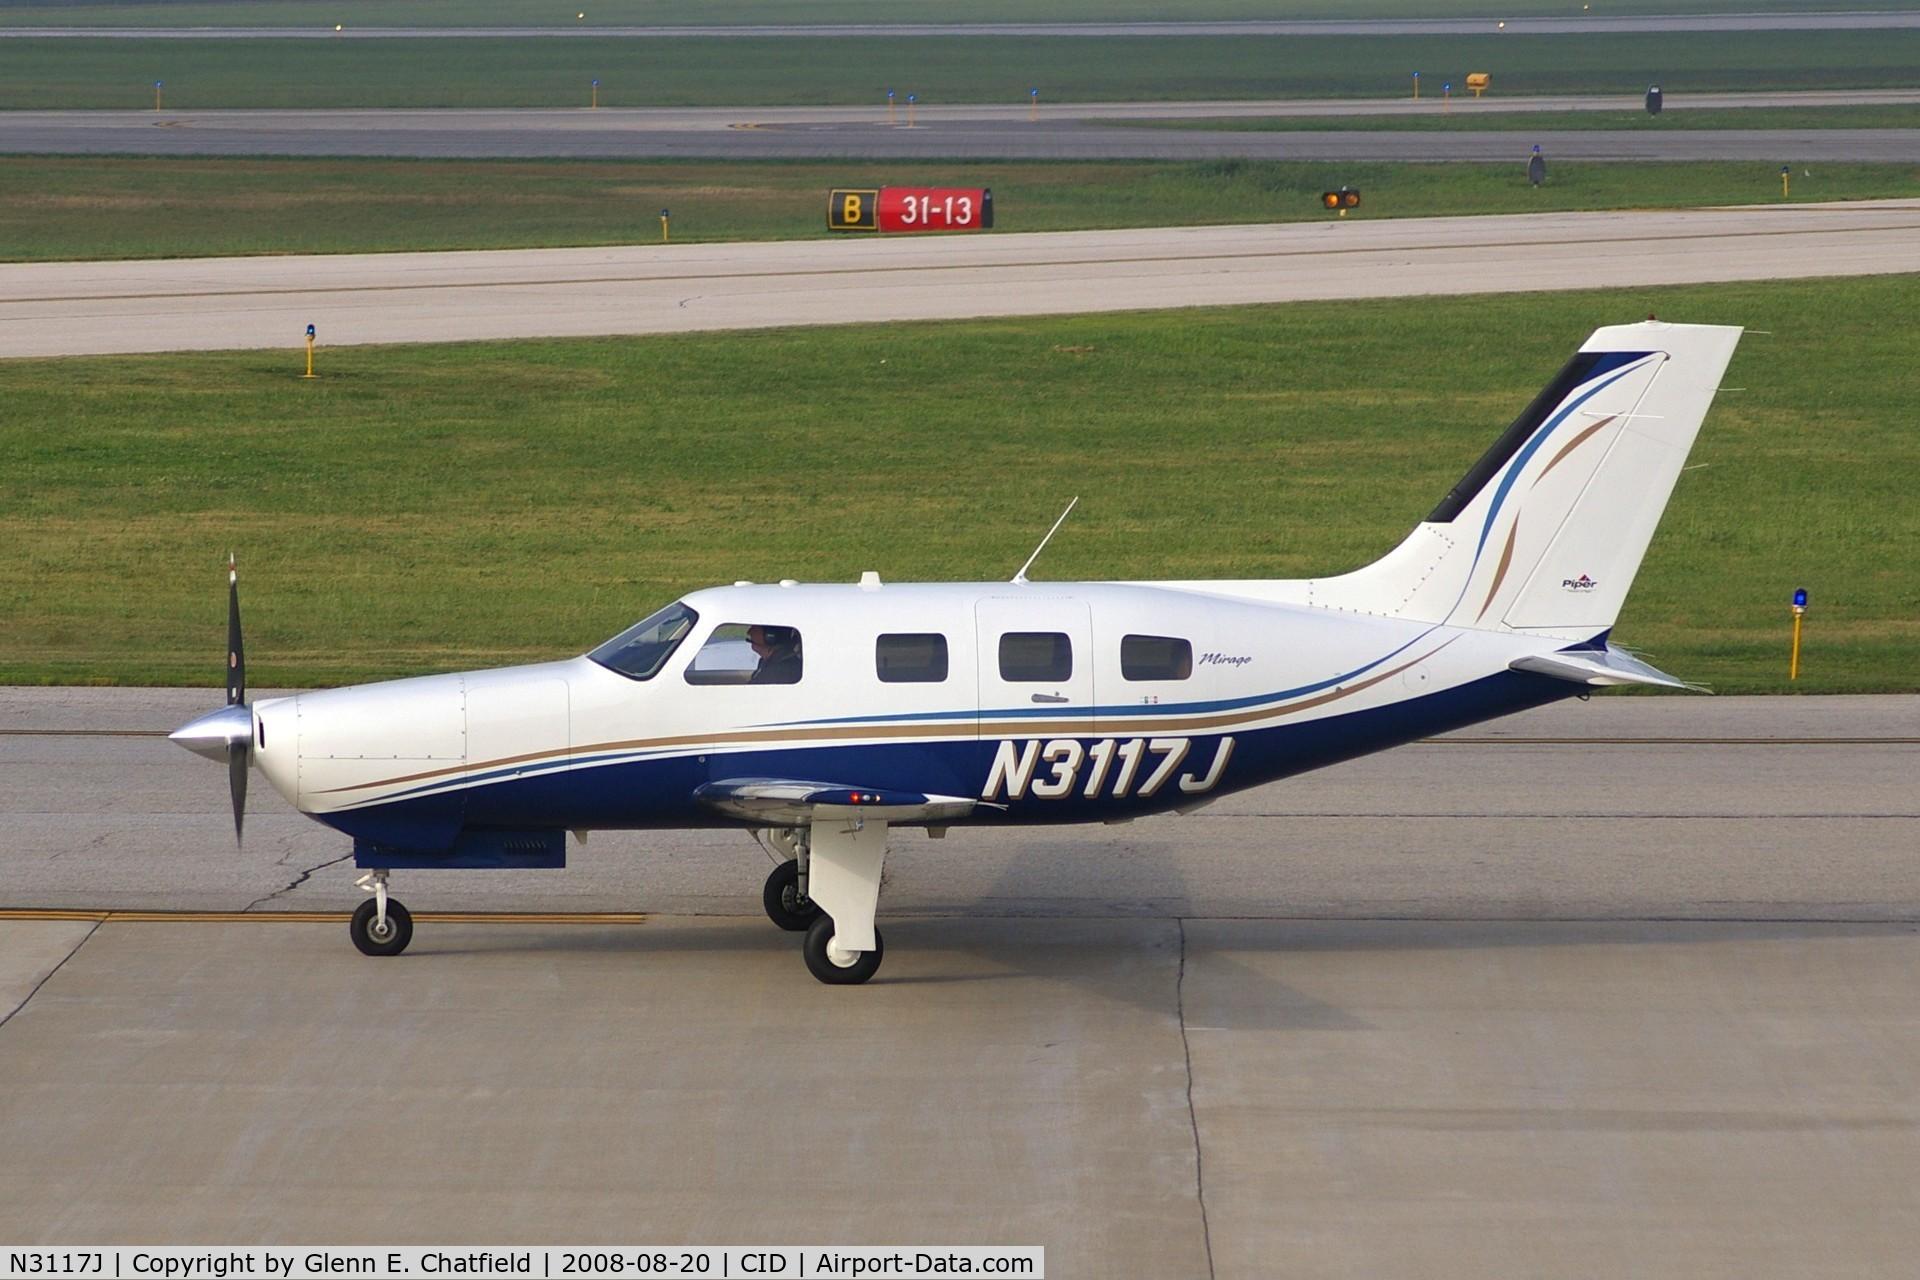 N3117J, 2005 Piper PA-46-350P Malibu Mirage C/N 4636366, Taxiing to Runway 27 for departure.